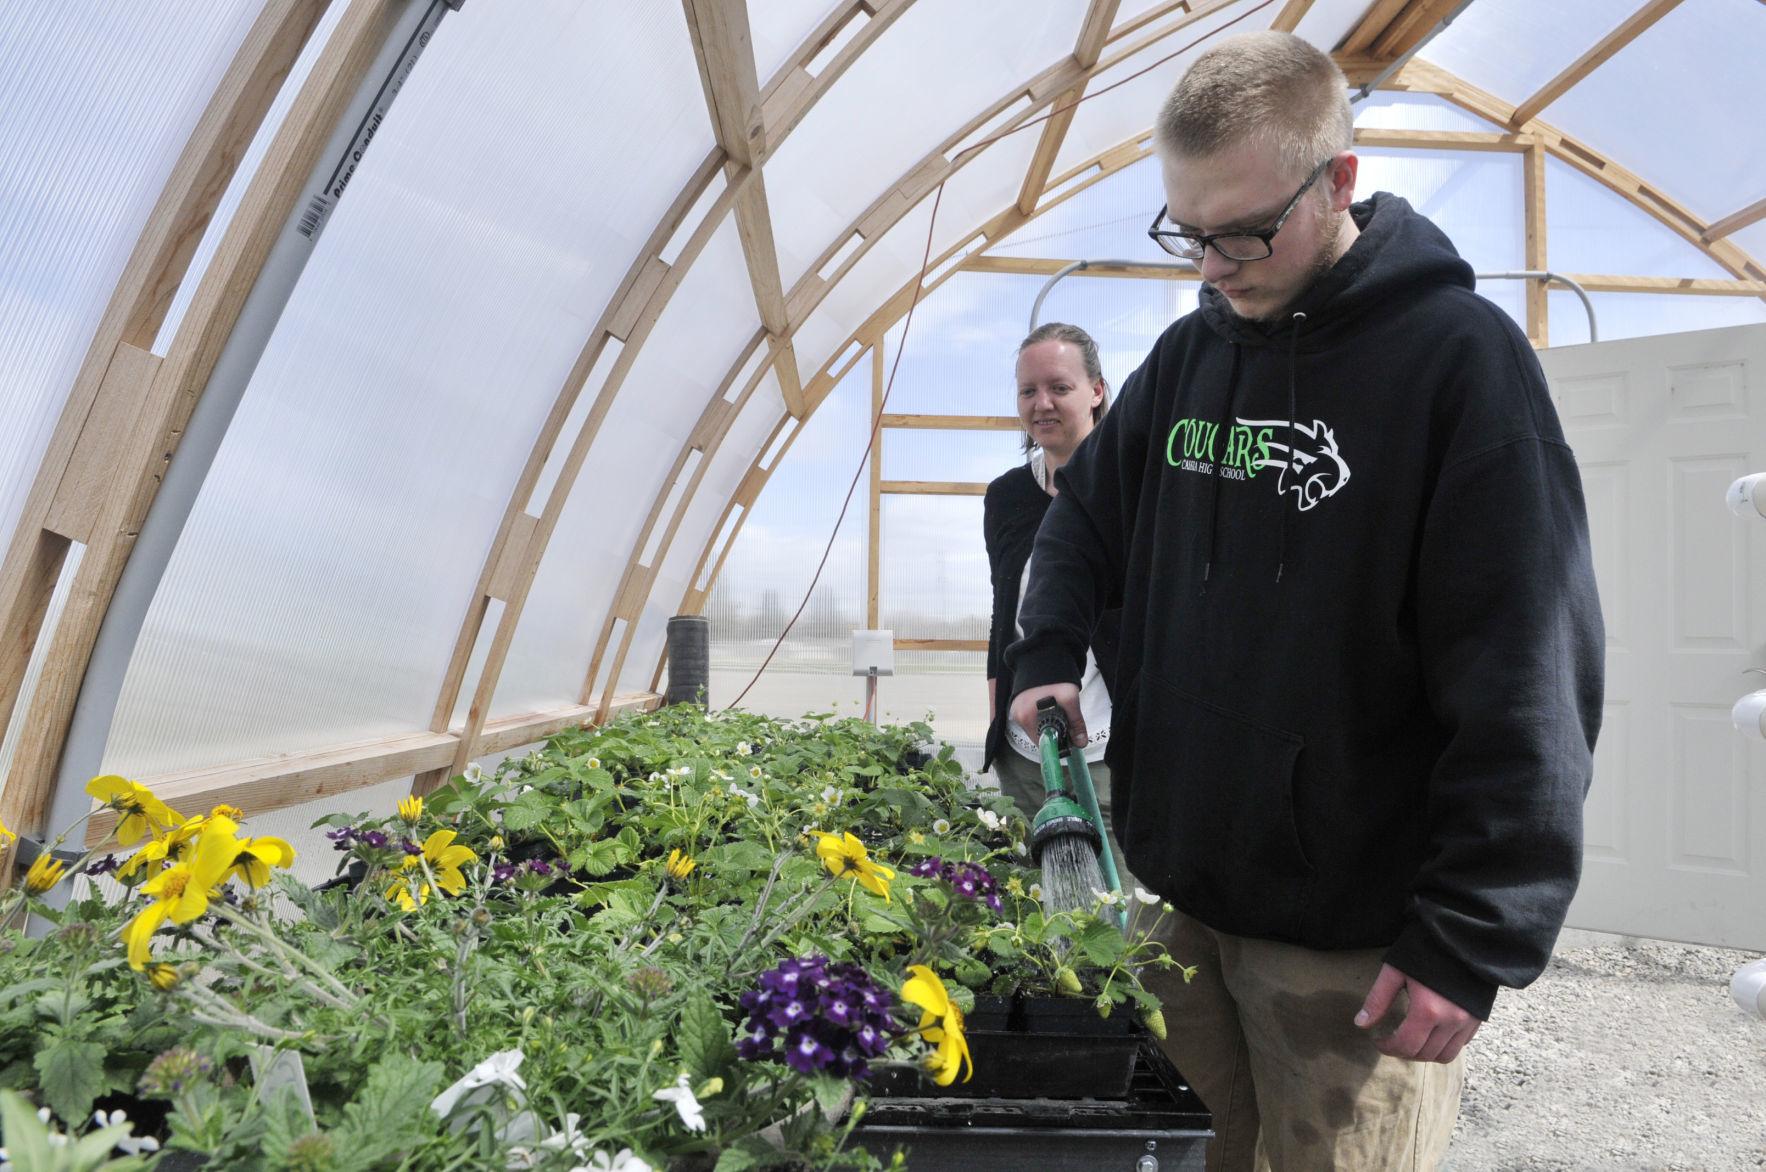 Burley alternative school teacher develops agricultural science